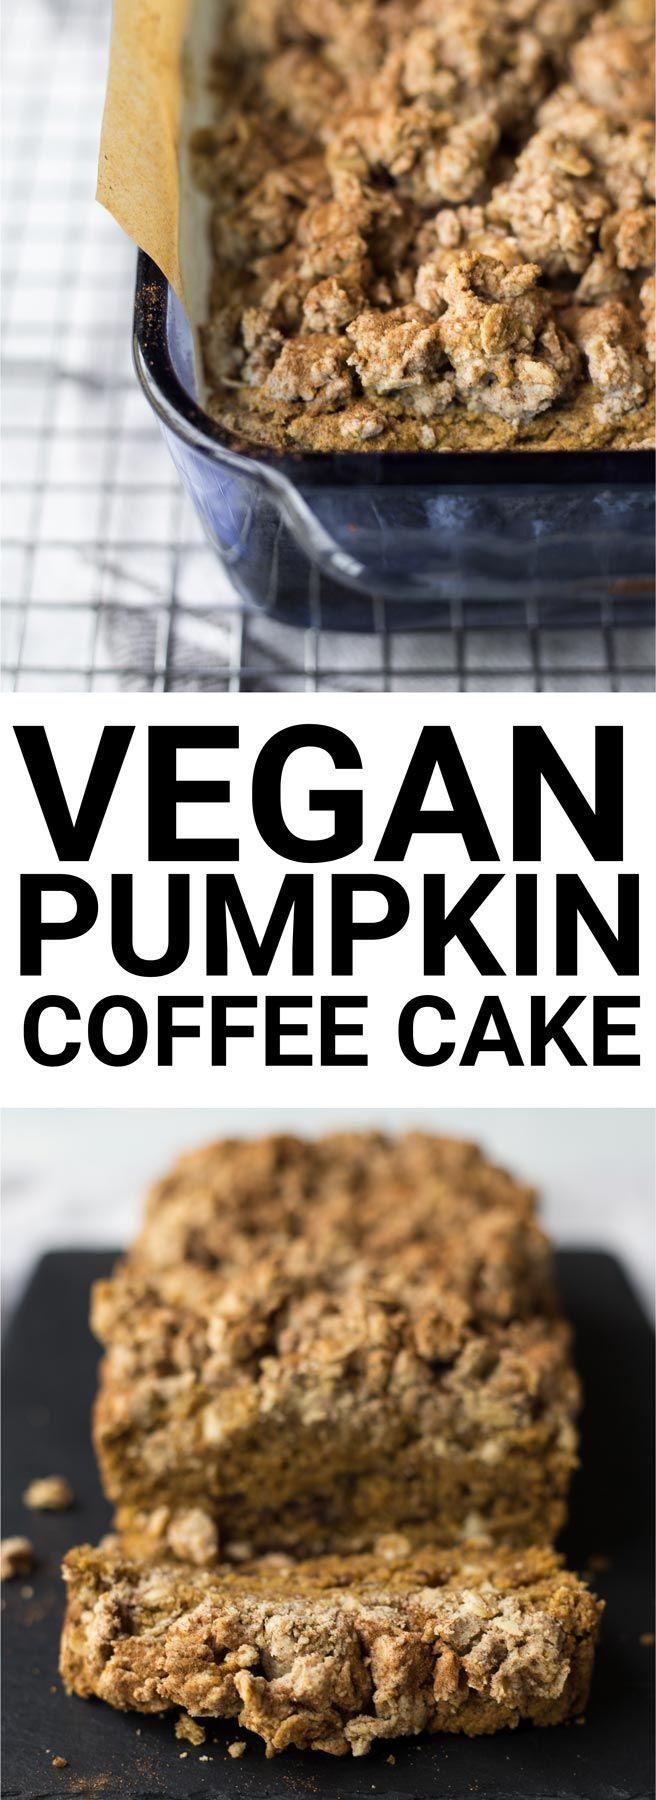 Vegan Pumpkin Coffee Cake Recipe (With images) Vegan